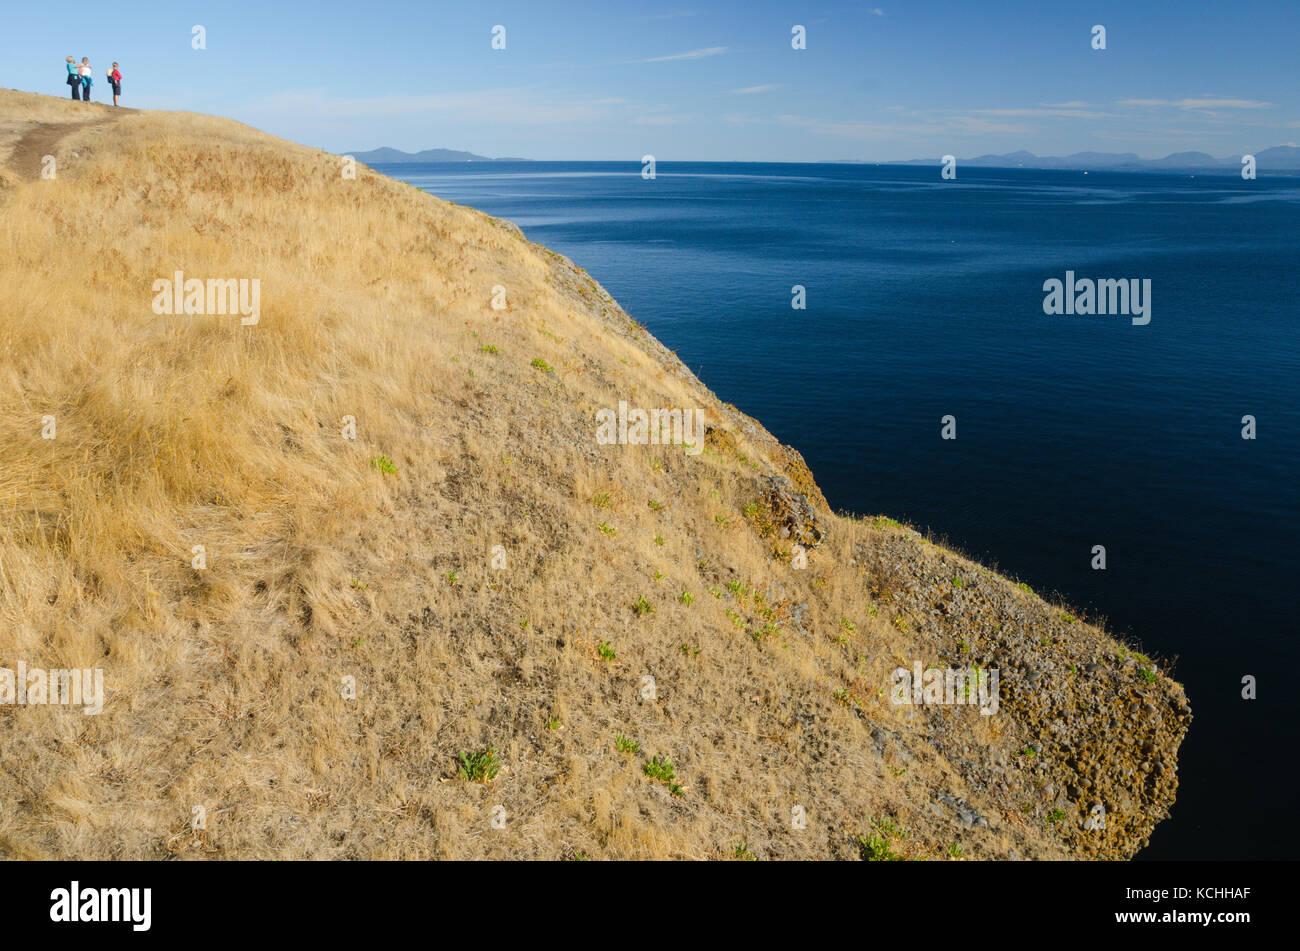 Three women gaze over the Straight of Georgia from Hornby Island, British Columbia - Stock Image